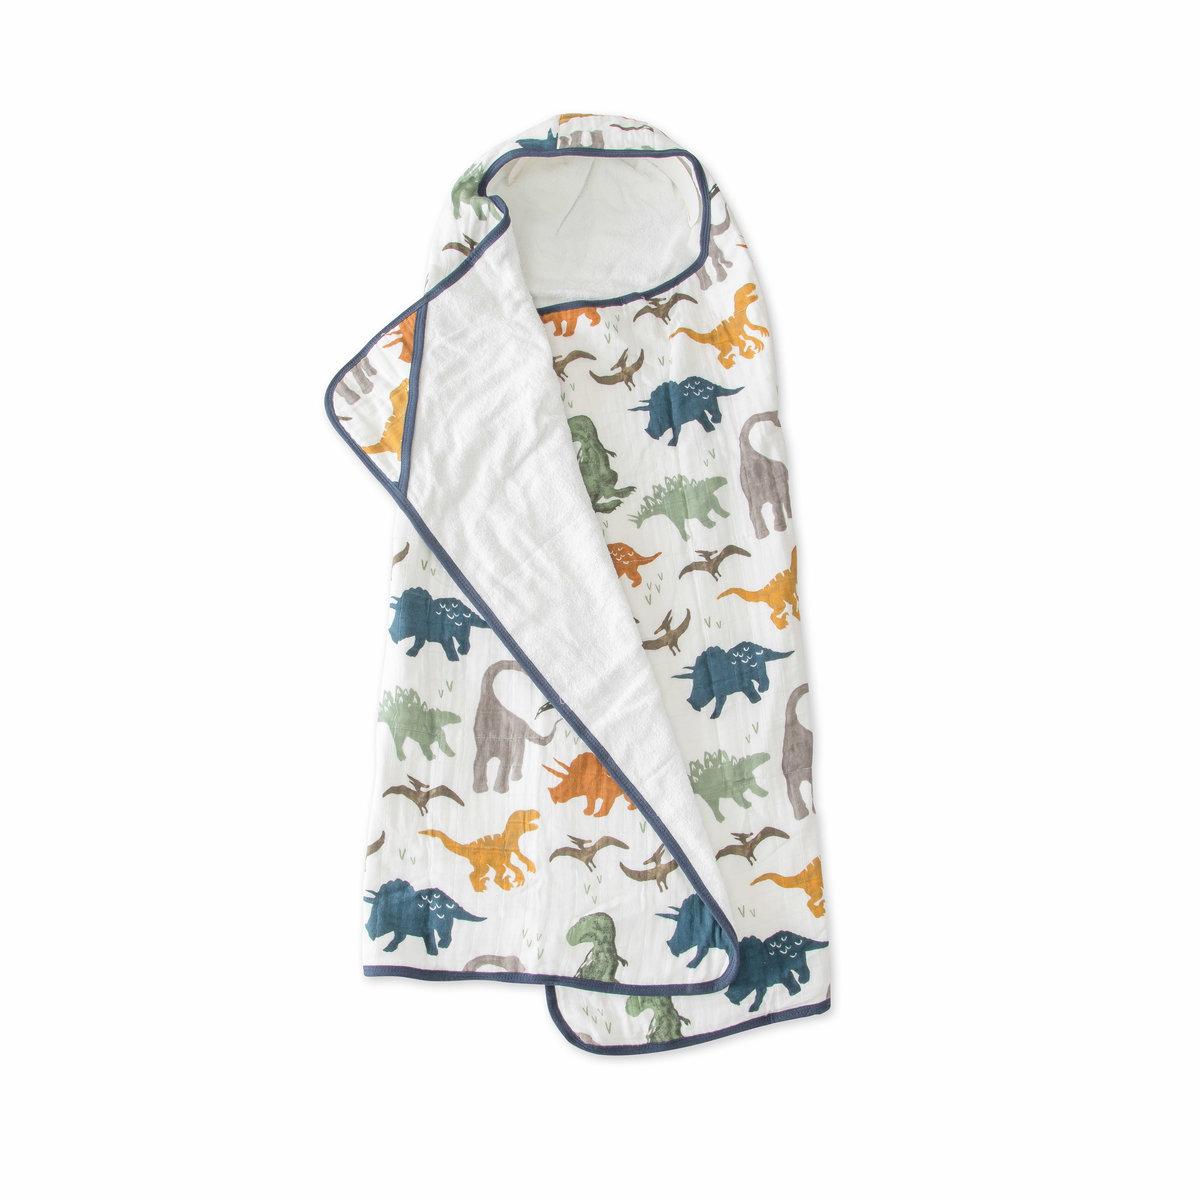 Cotton Hooded Towel Big Kid, Dino Friends